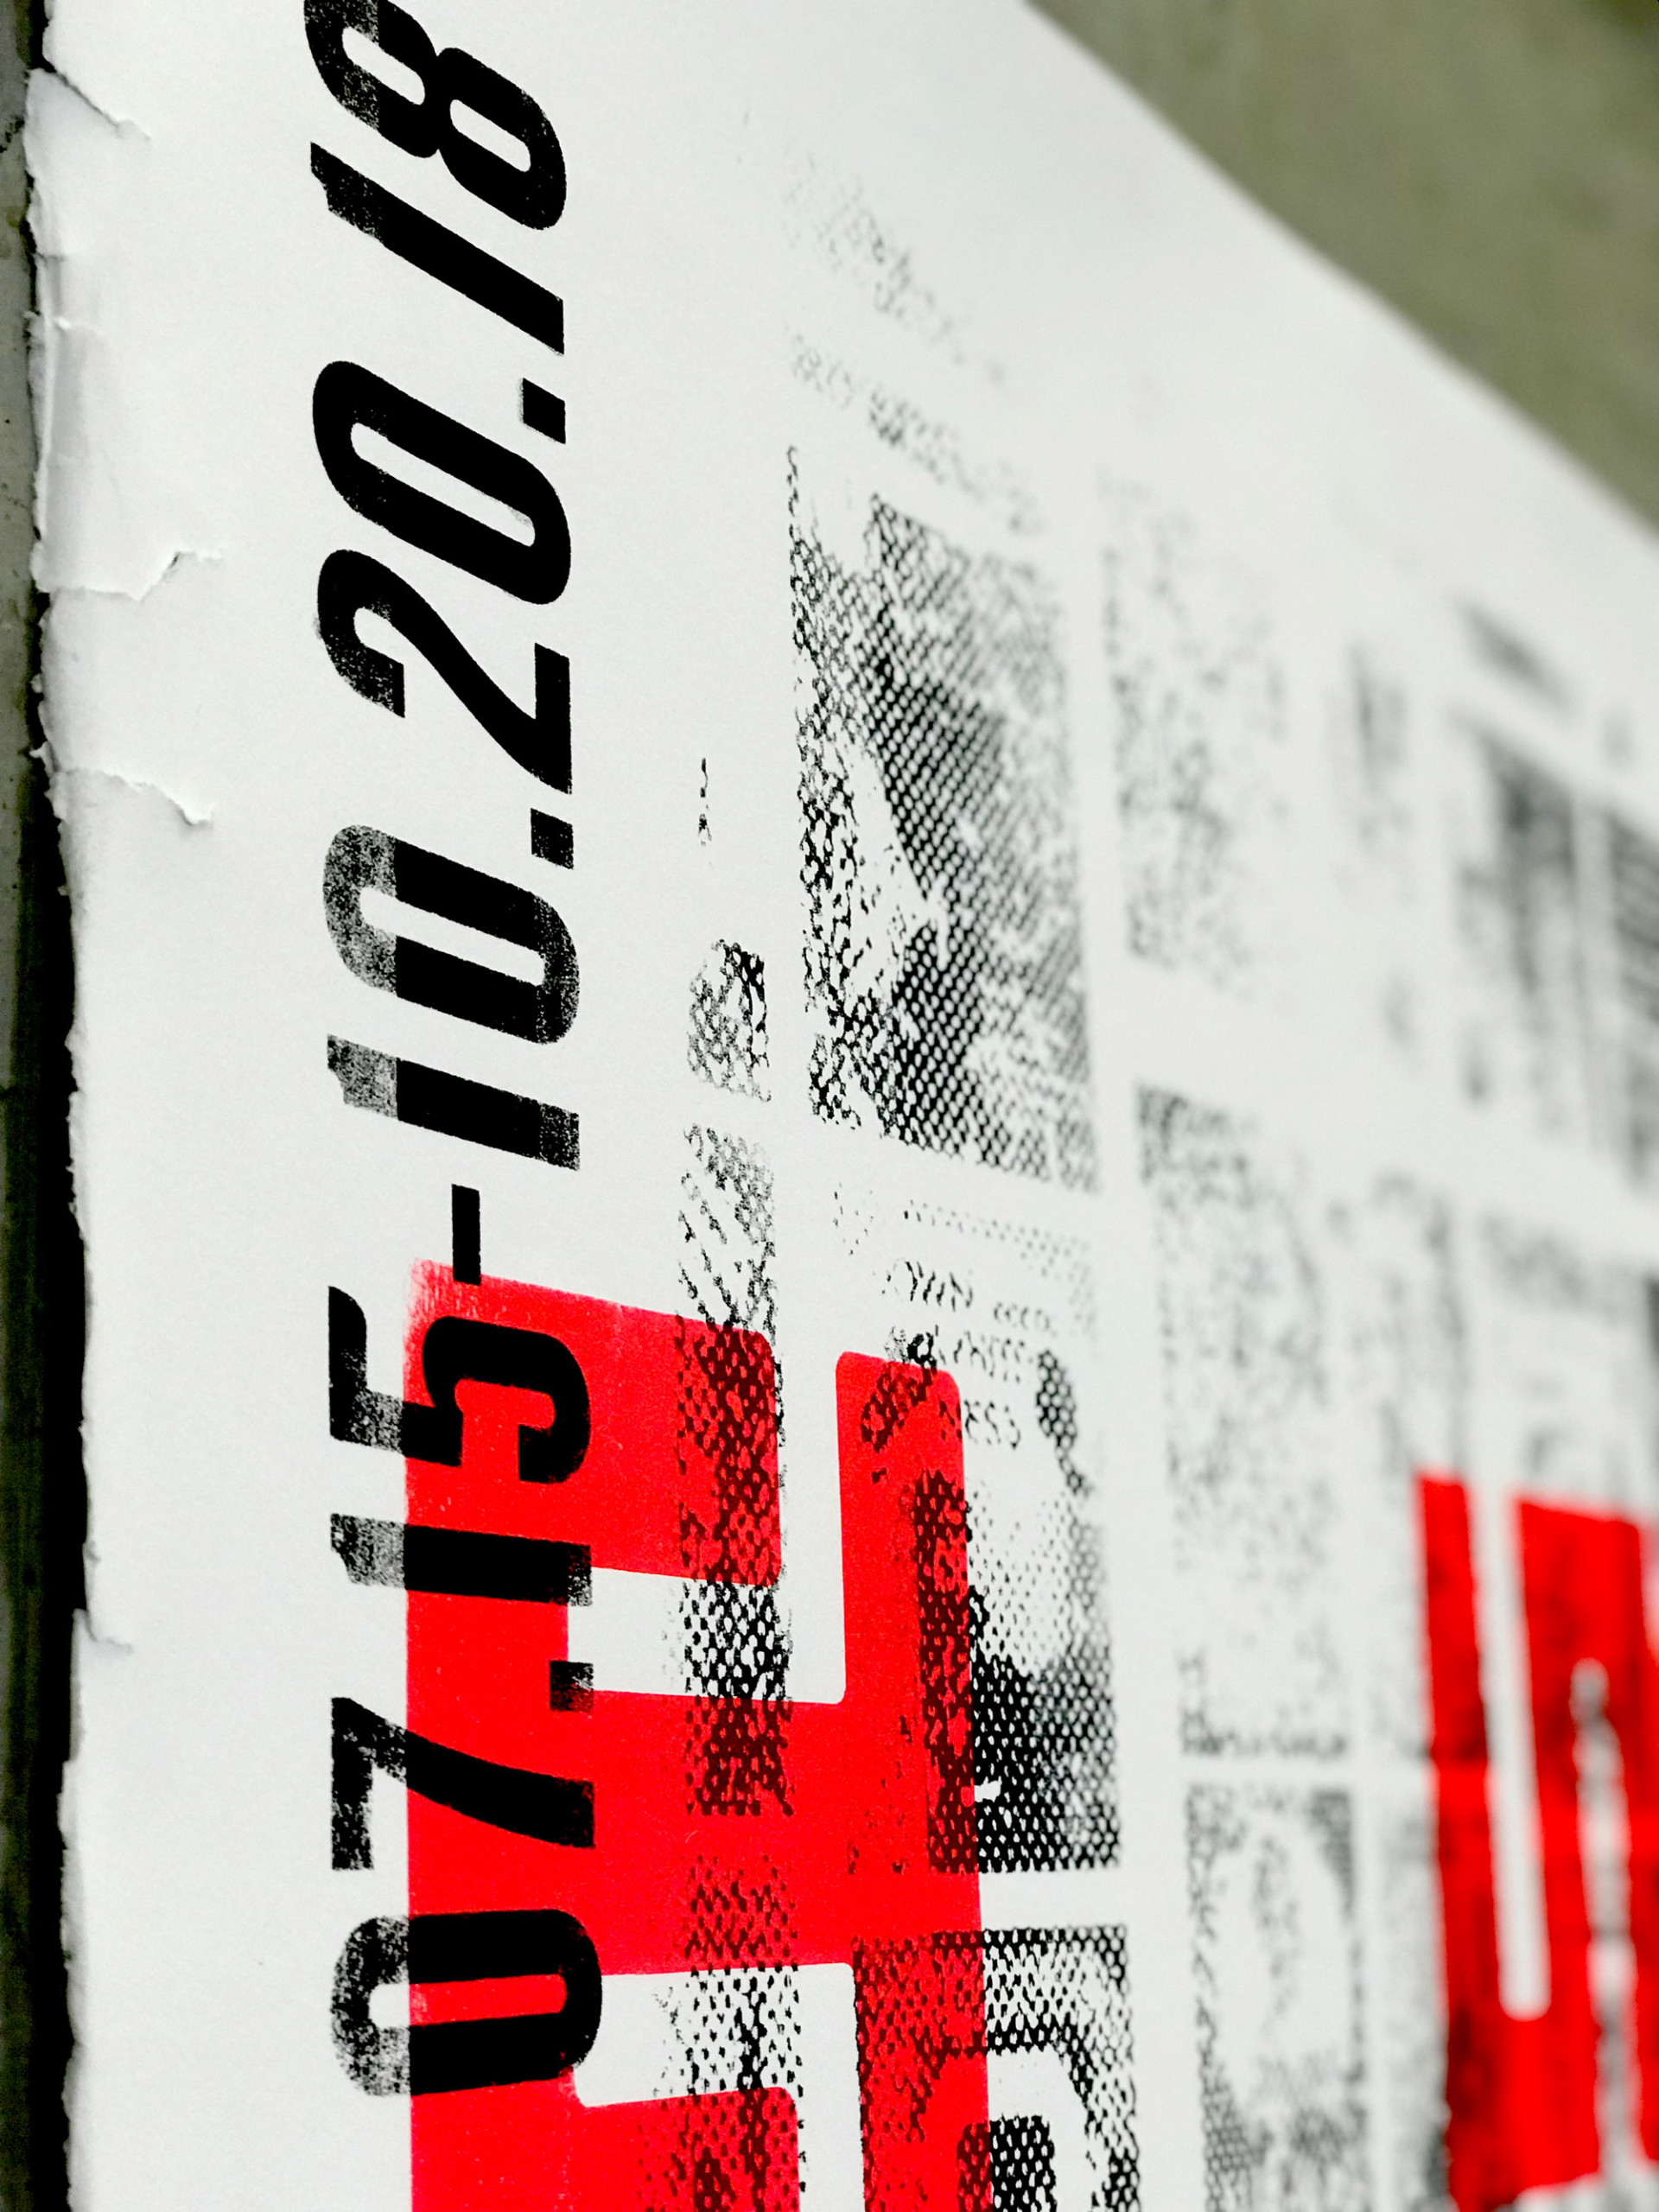 David Jimenez Self Help Graphics & Art